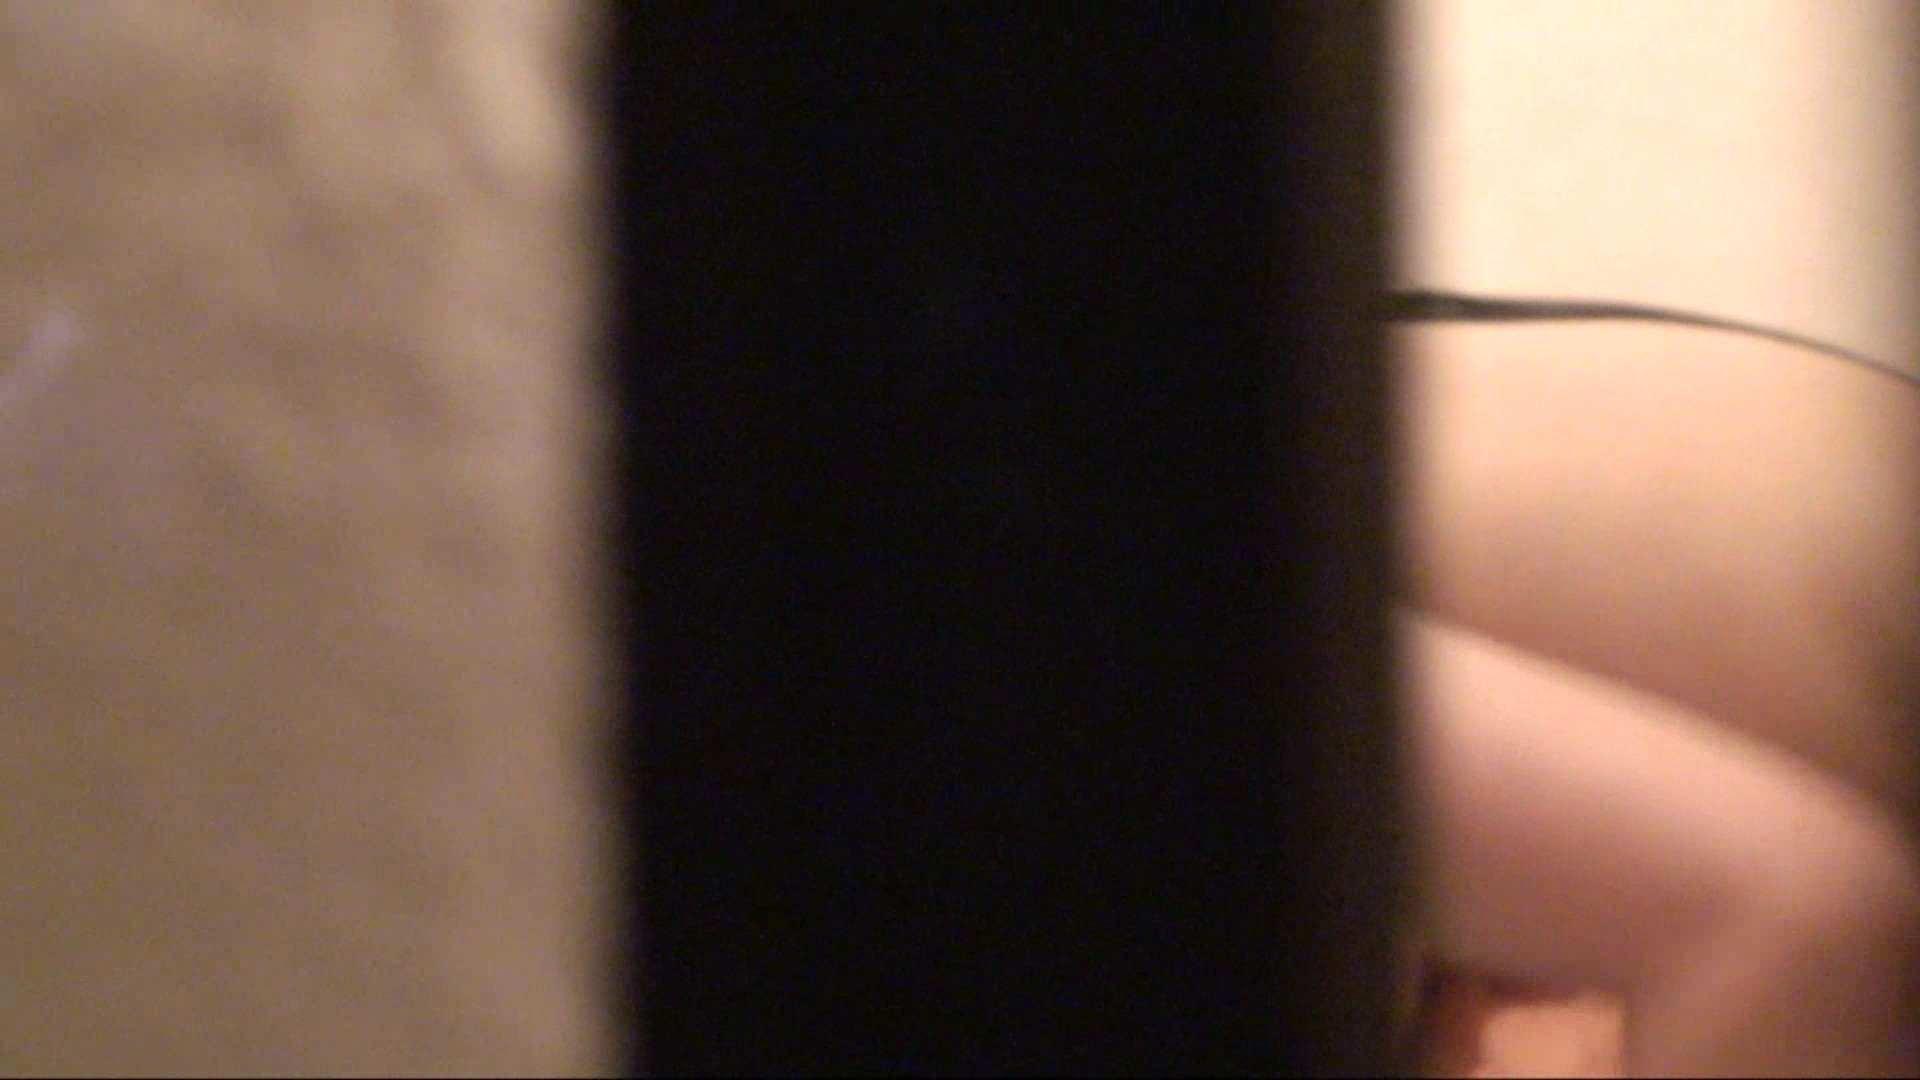 vol.01必見!白肌嬢の乳首が丸見え。極上美人のすっぴん顔をハイビジョンで! 美人 エロ無料画像 89pic 47